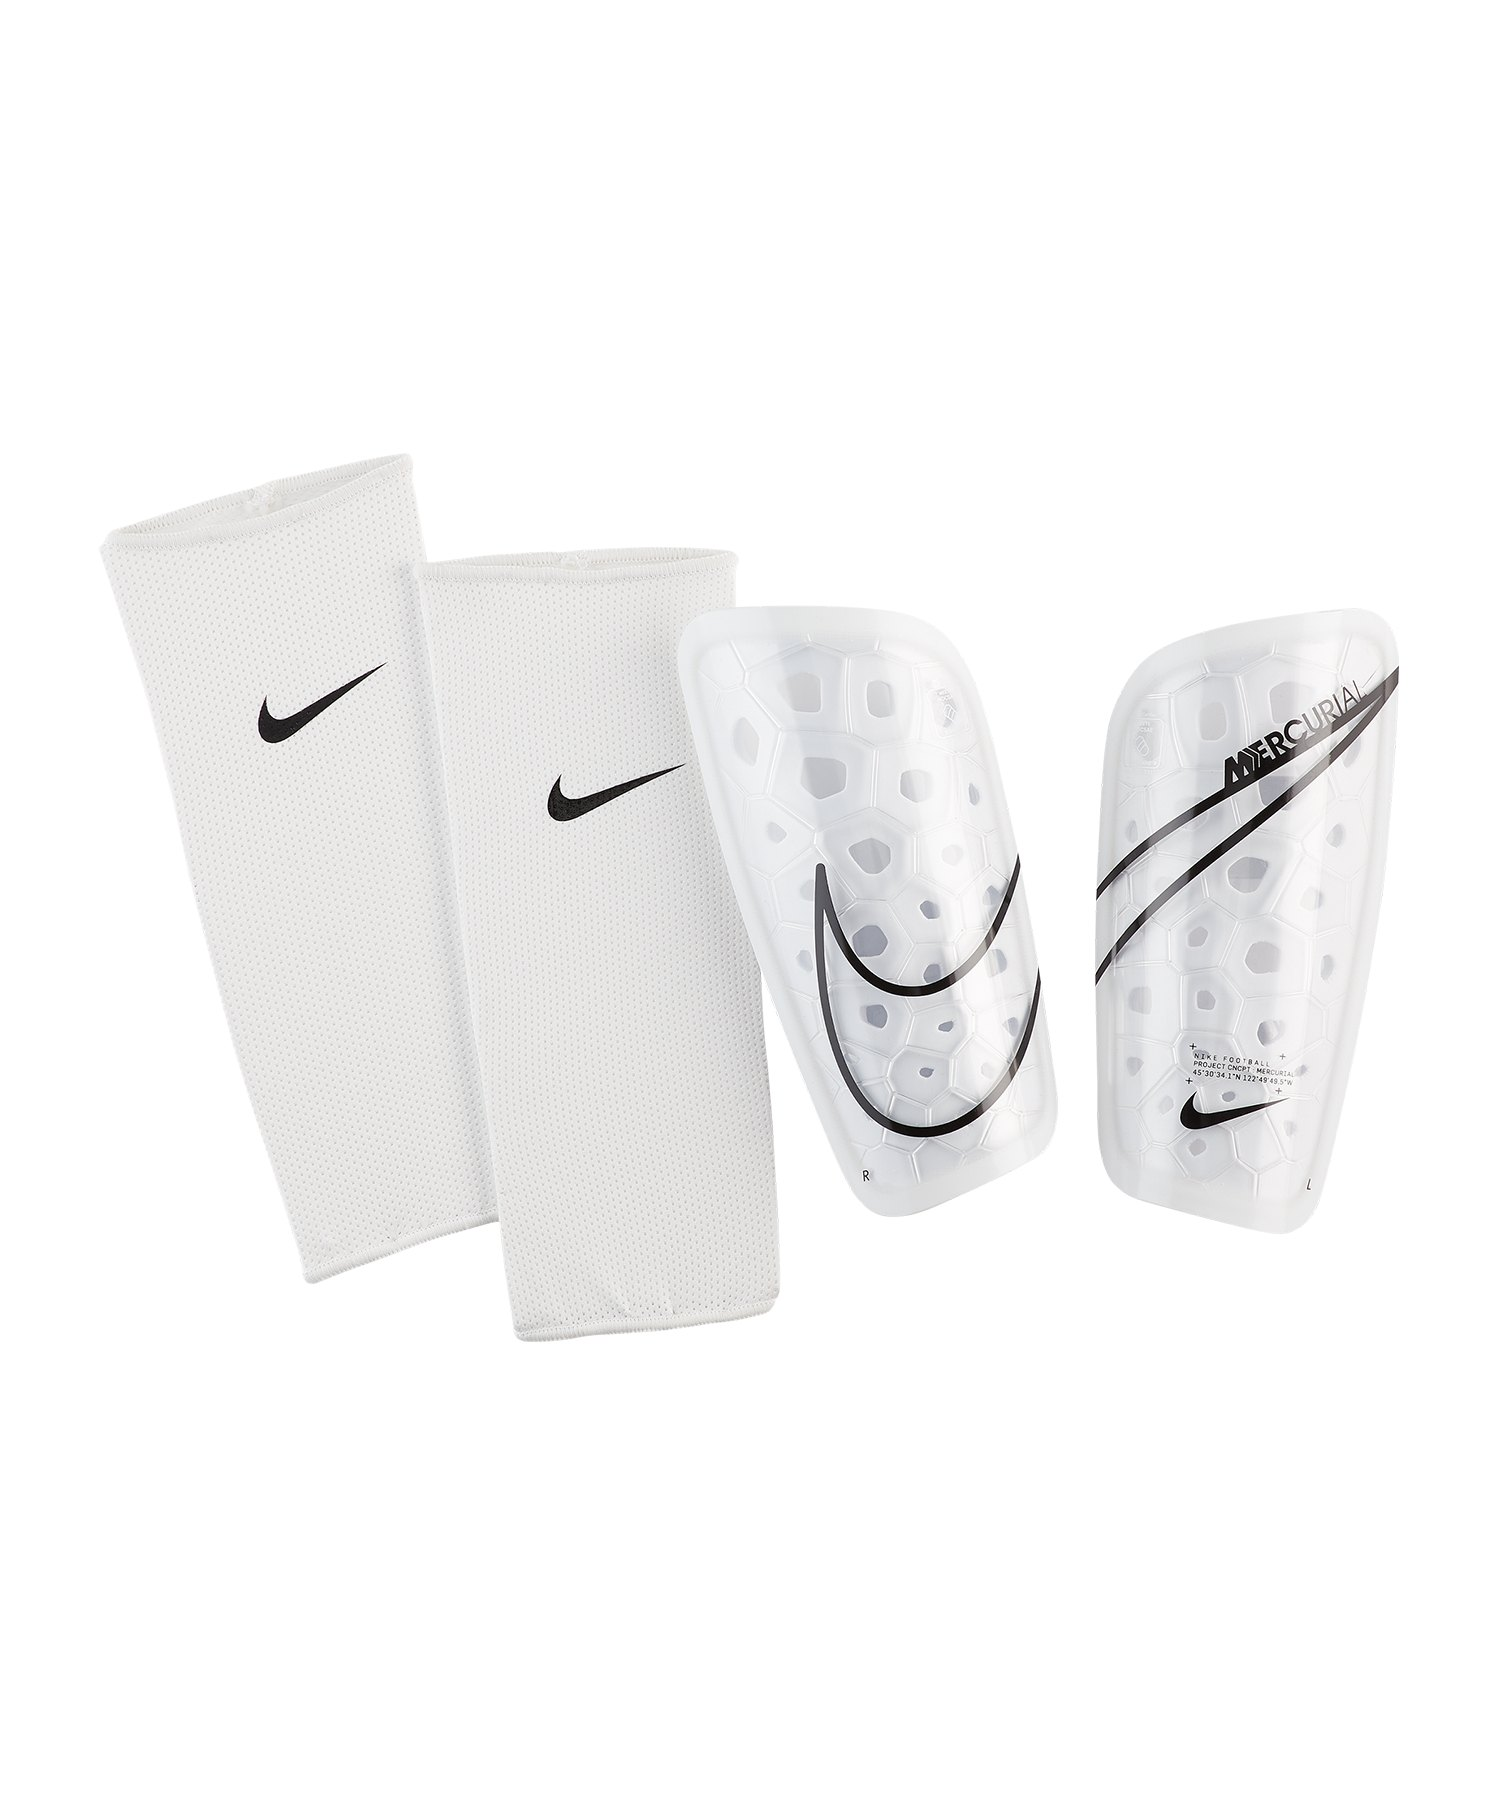 Nike Mercurial Lite Schienbeinschoner F104 - weiss